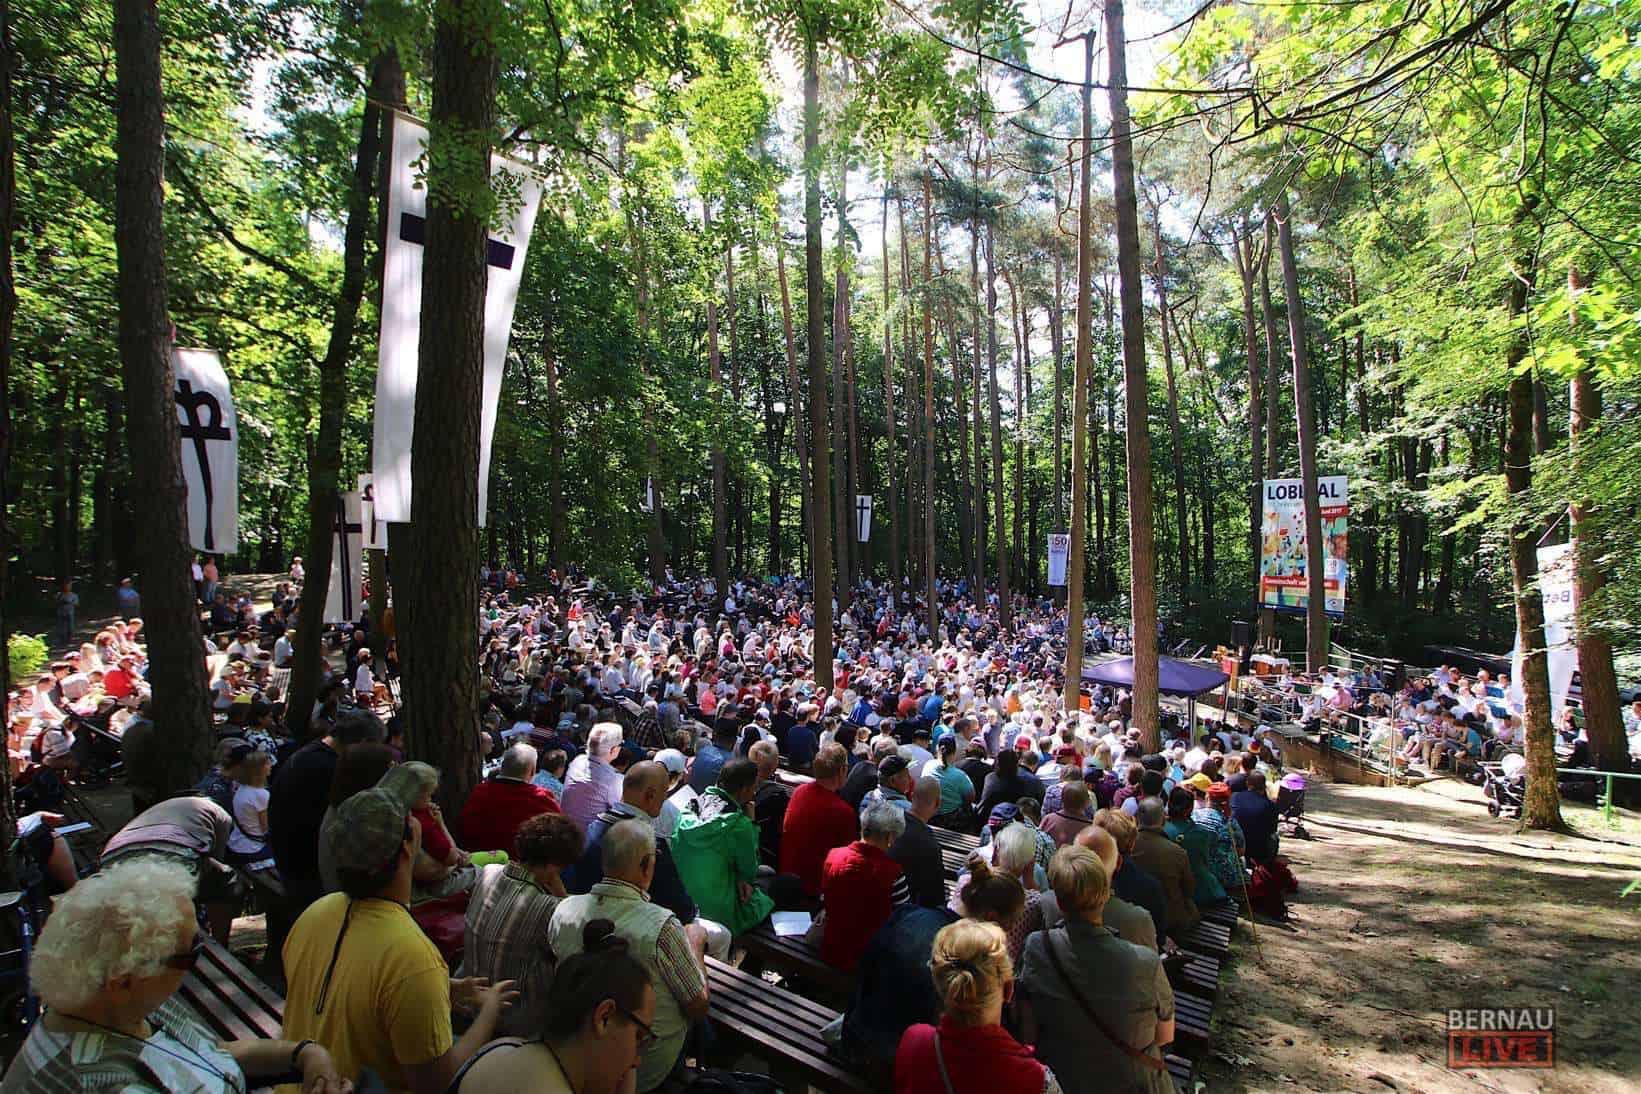 Bernau: 113. Jahresfest in Lobetal - Konzert am Mechesee - Bus-Shuttle